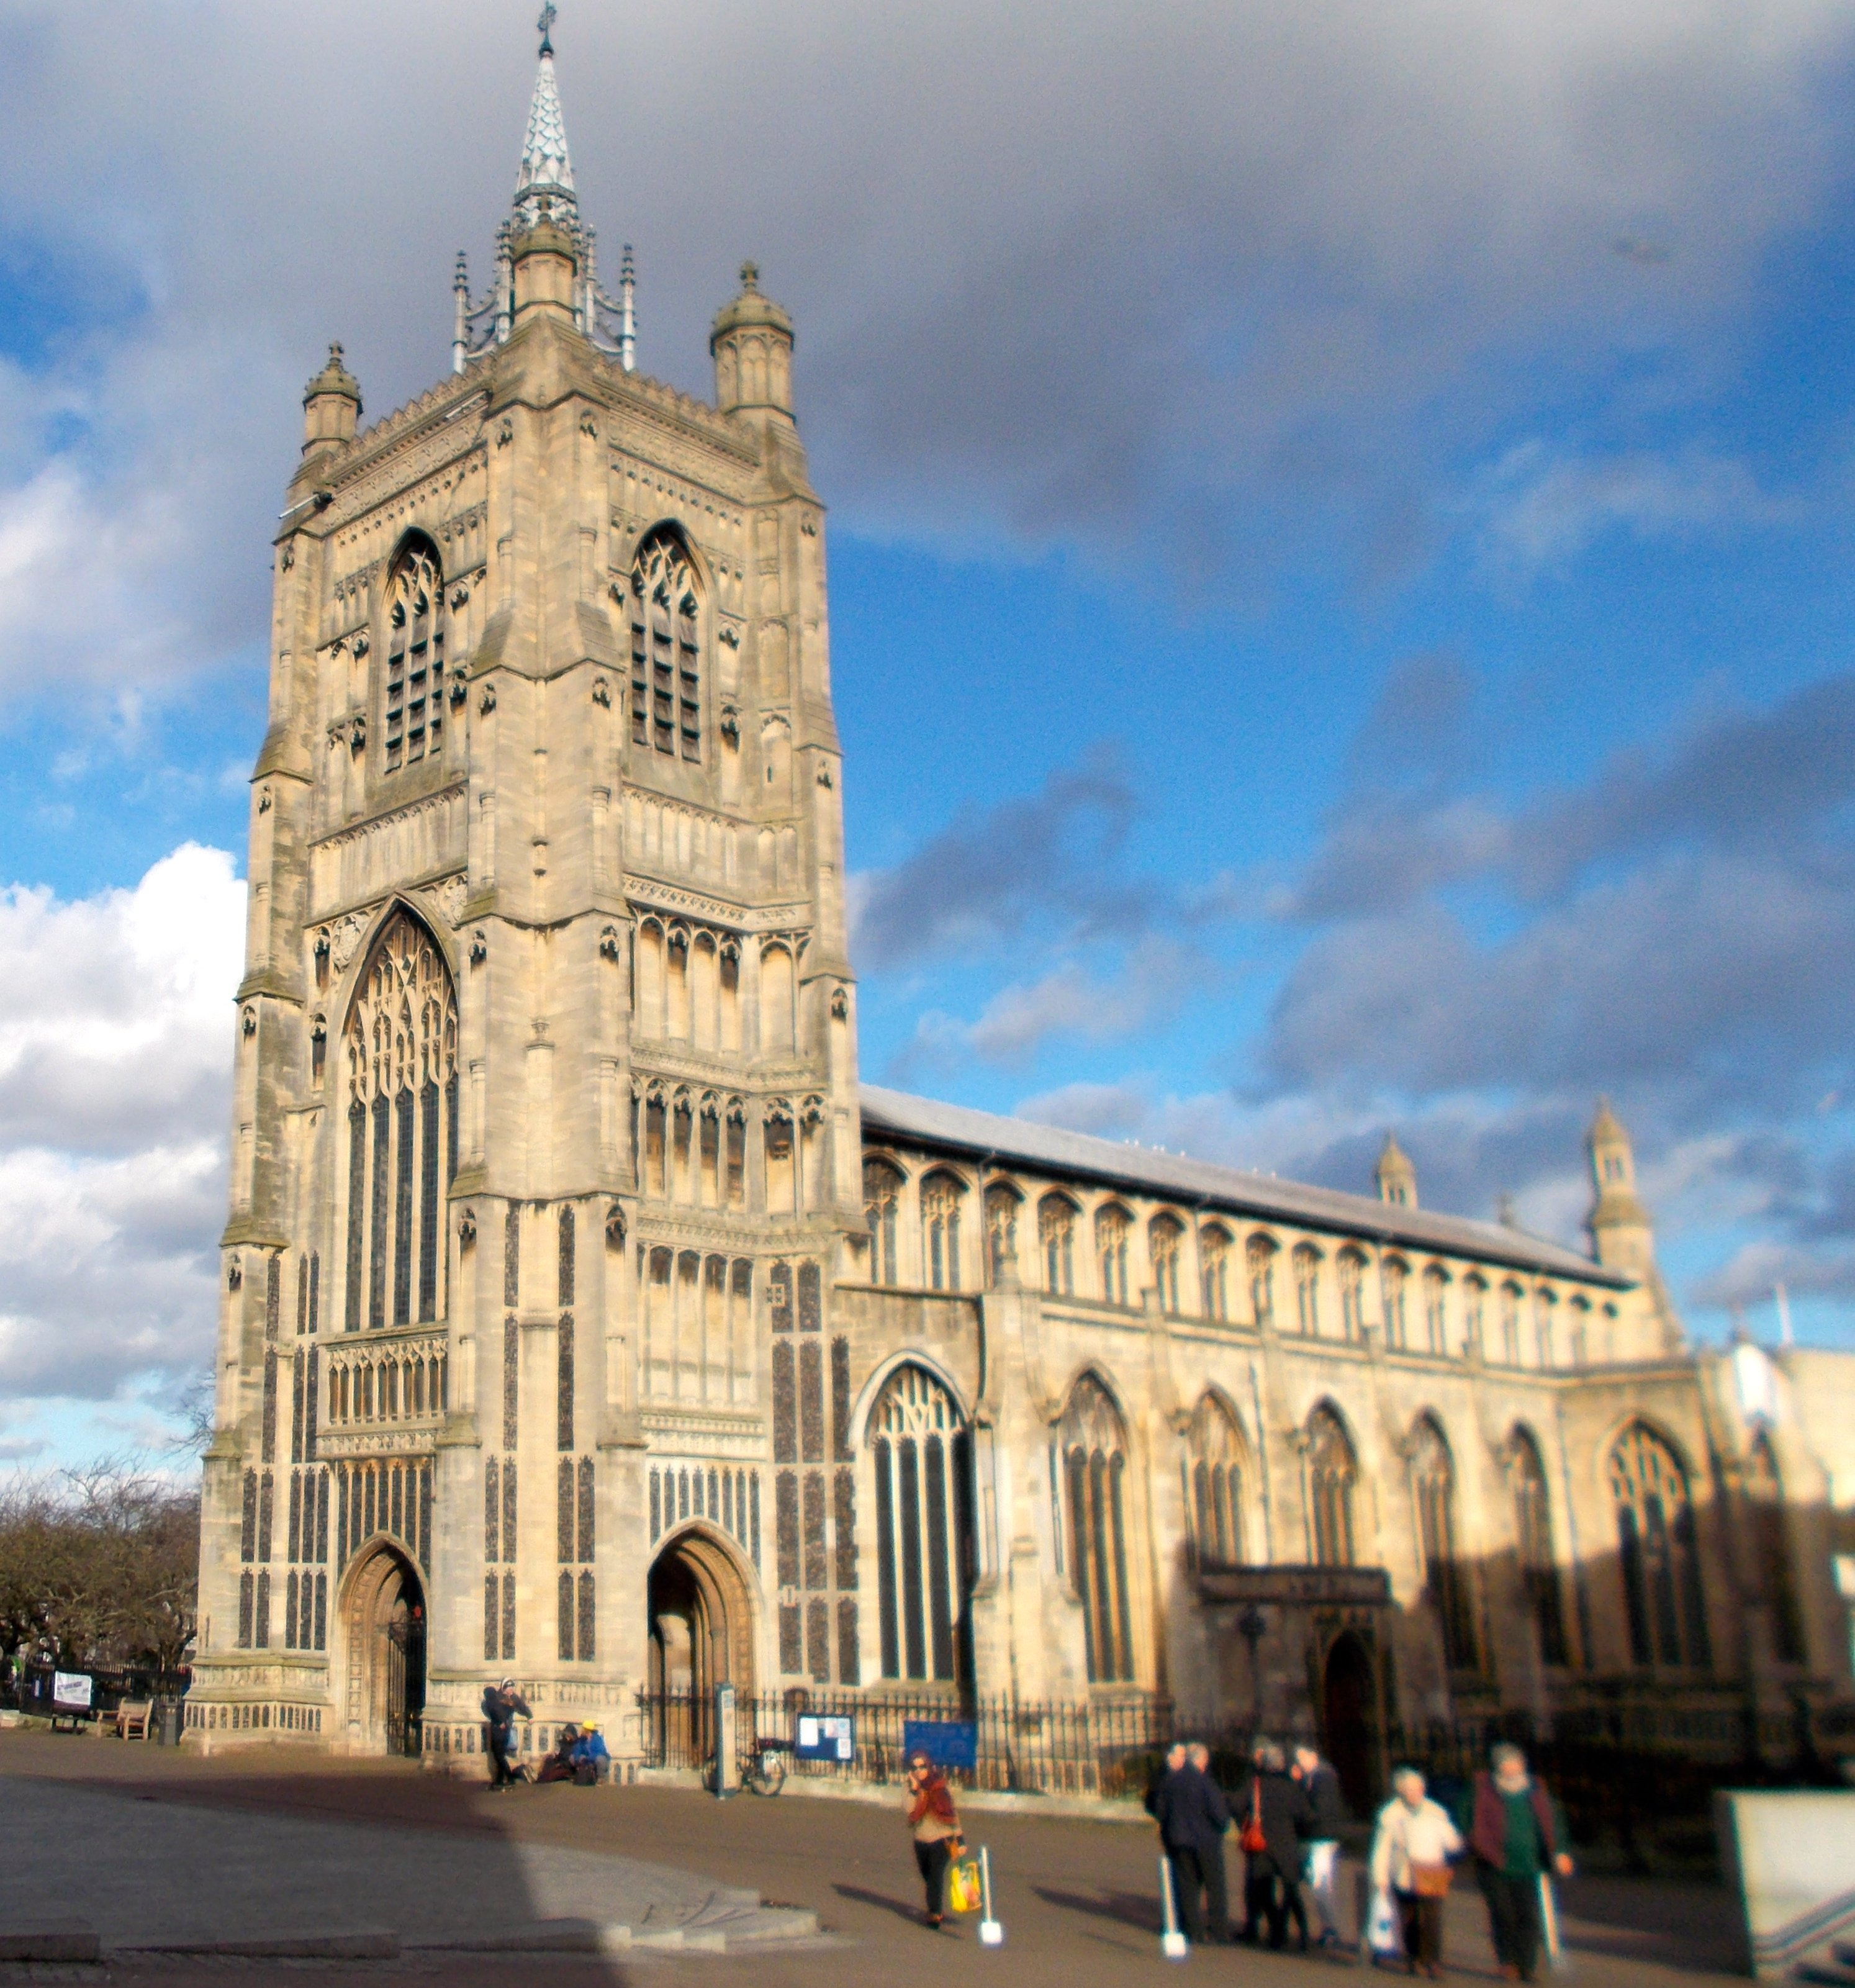 View of St Peter Mancroft Norwich